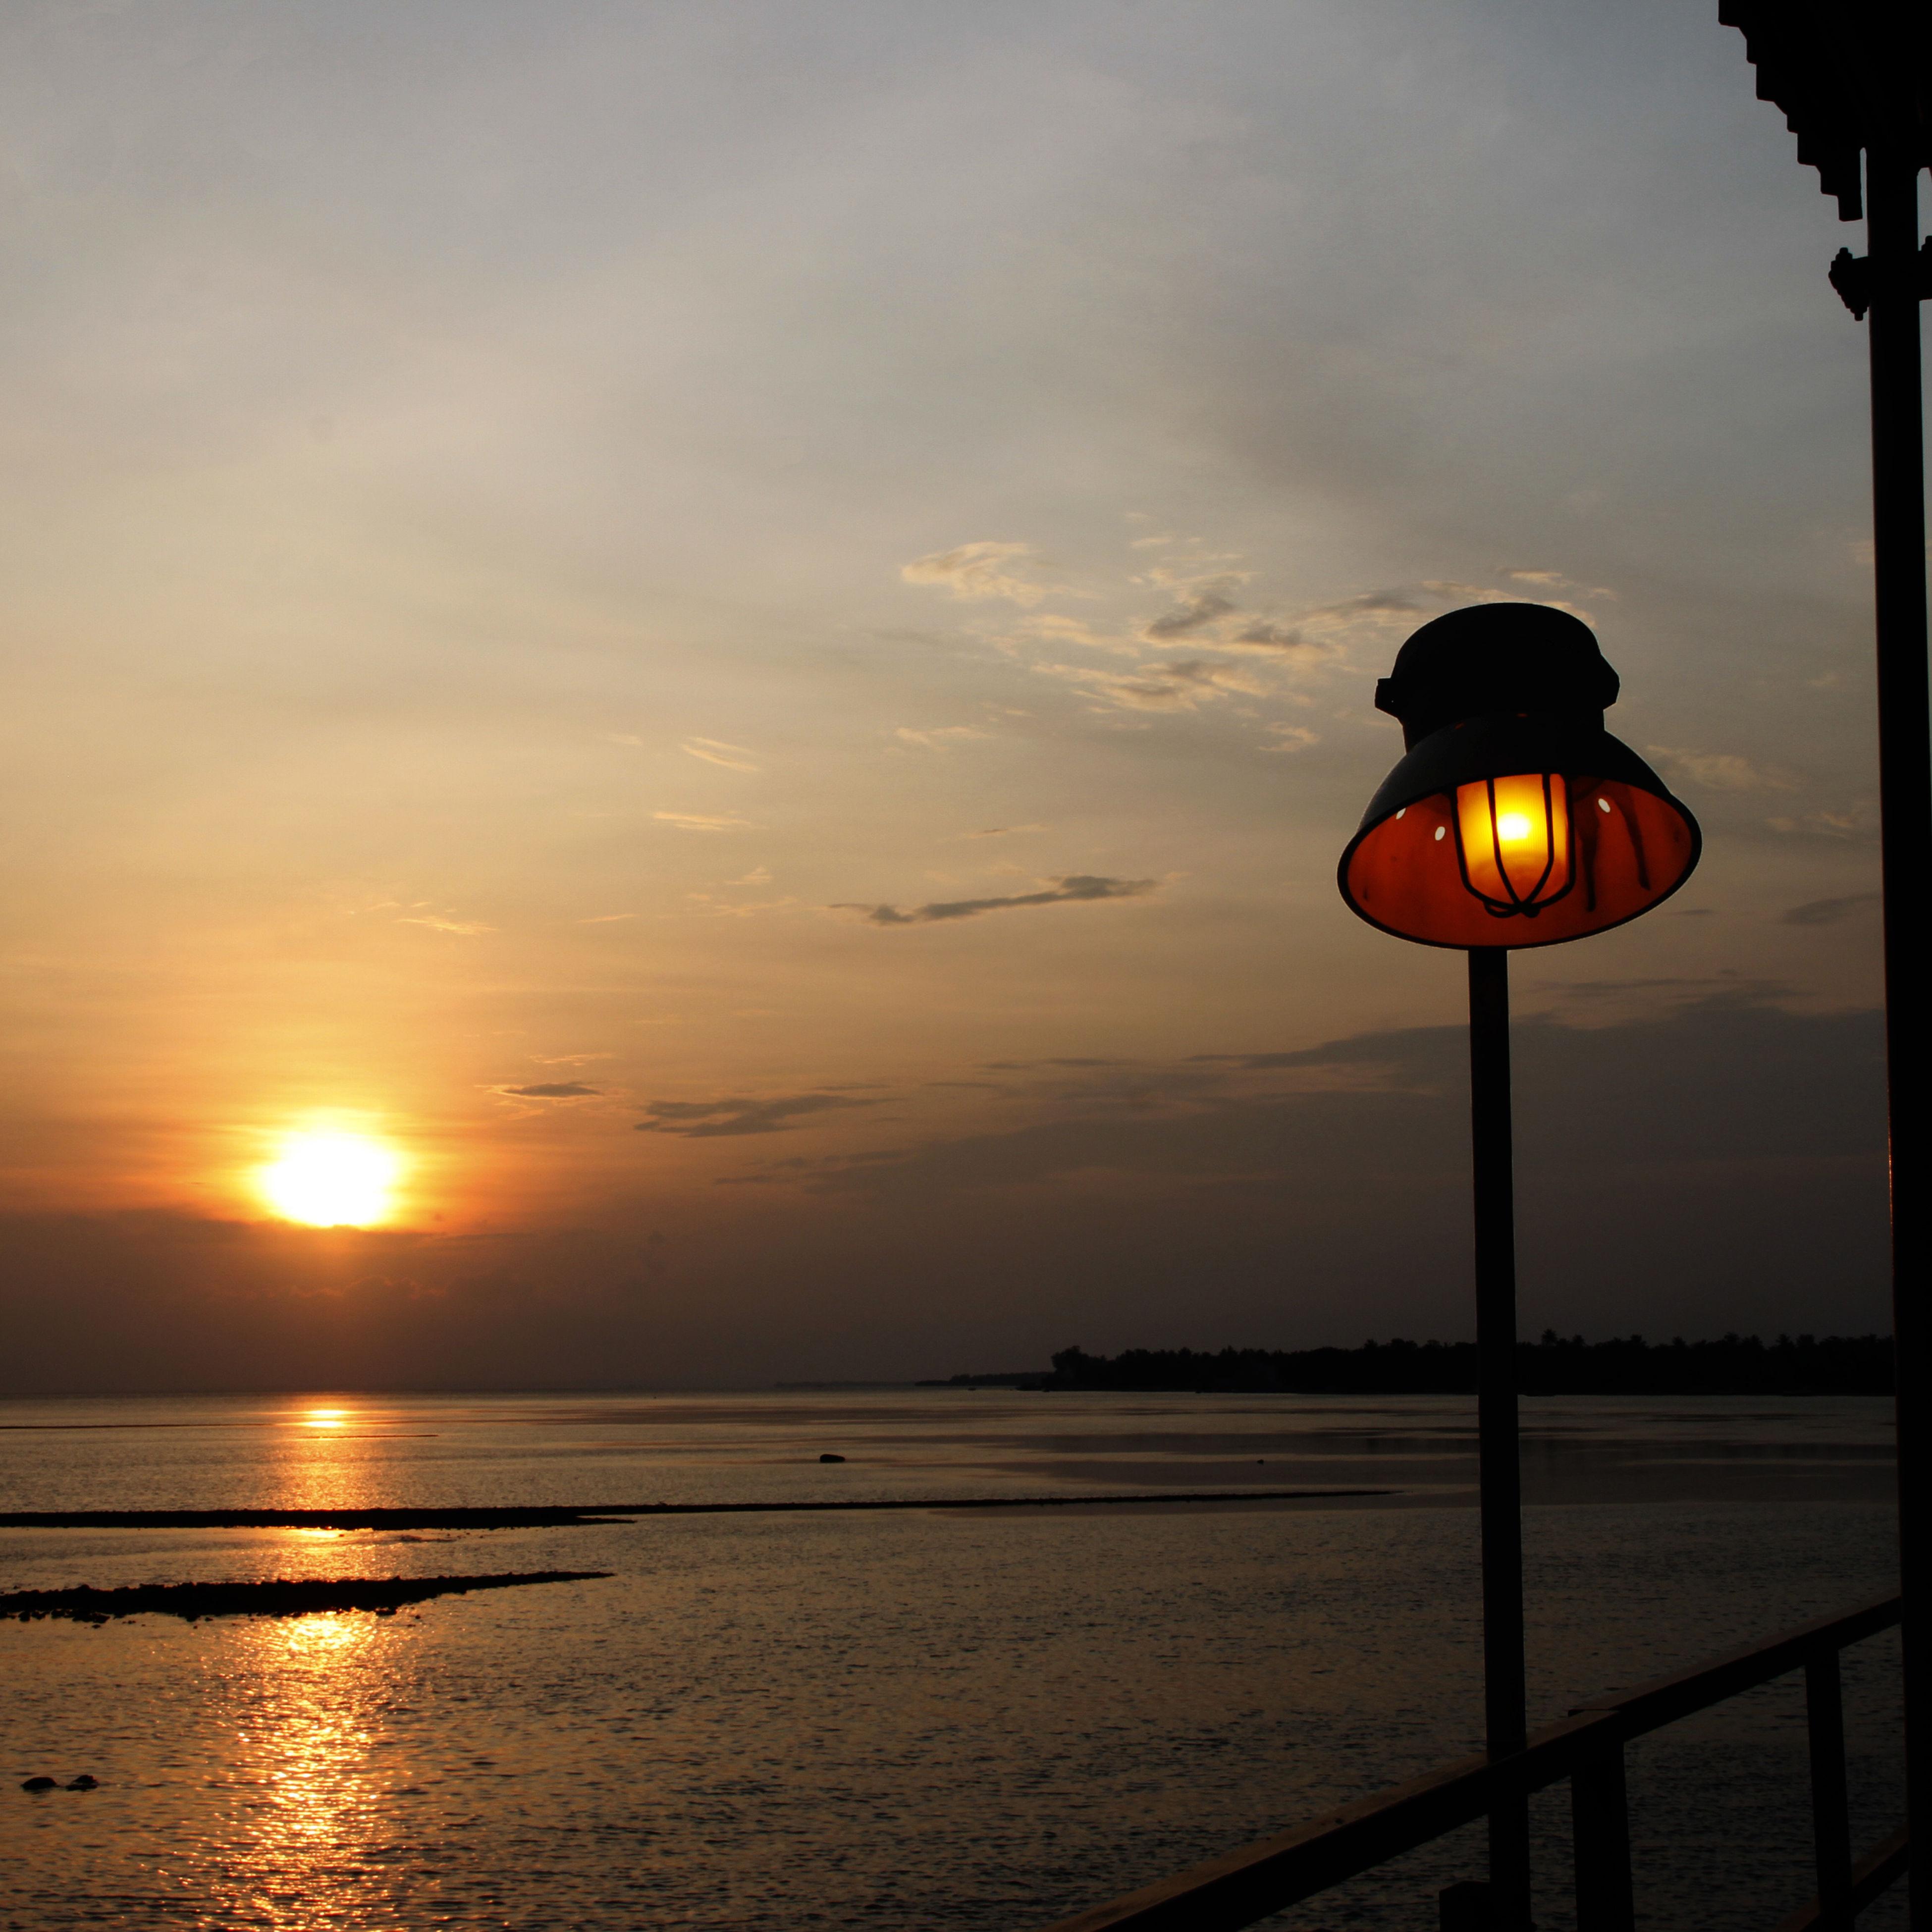 sunset, water, sky, sea, scenics, street light, tranquility, tranquil scene, lighting equipment, beauty in nature, sun, orange color, illuminated, nature, silhouette, idyllic, cloud - sky, reflection, horizon over water, beach